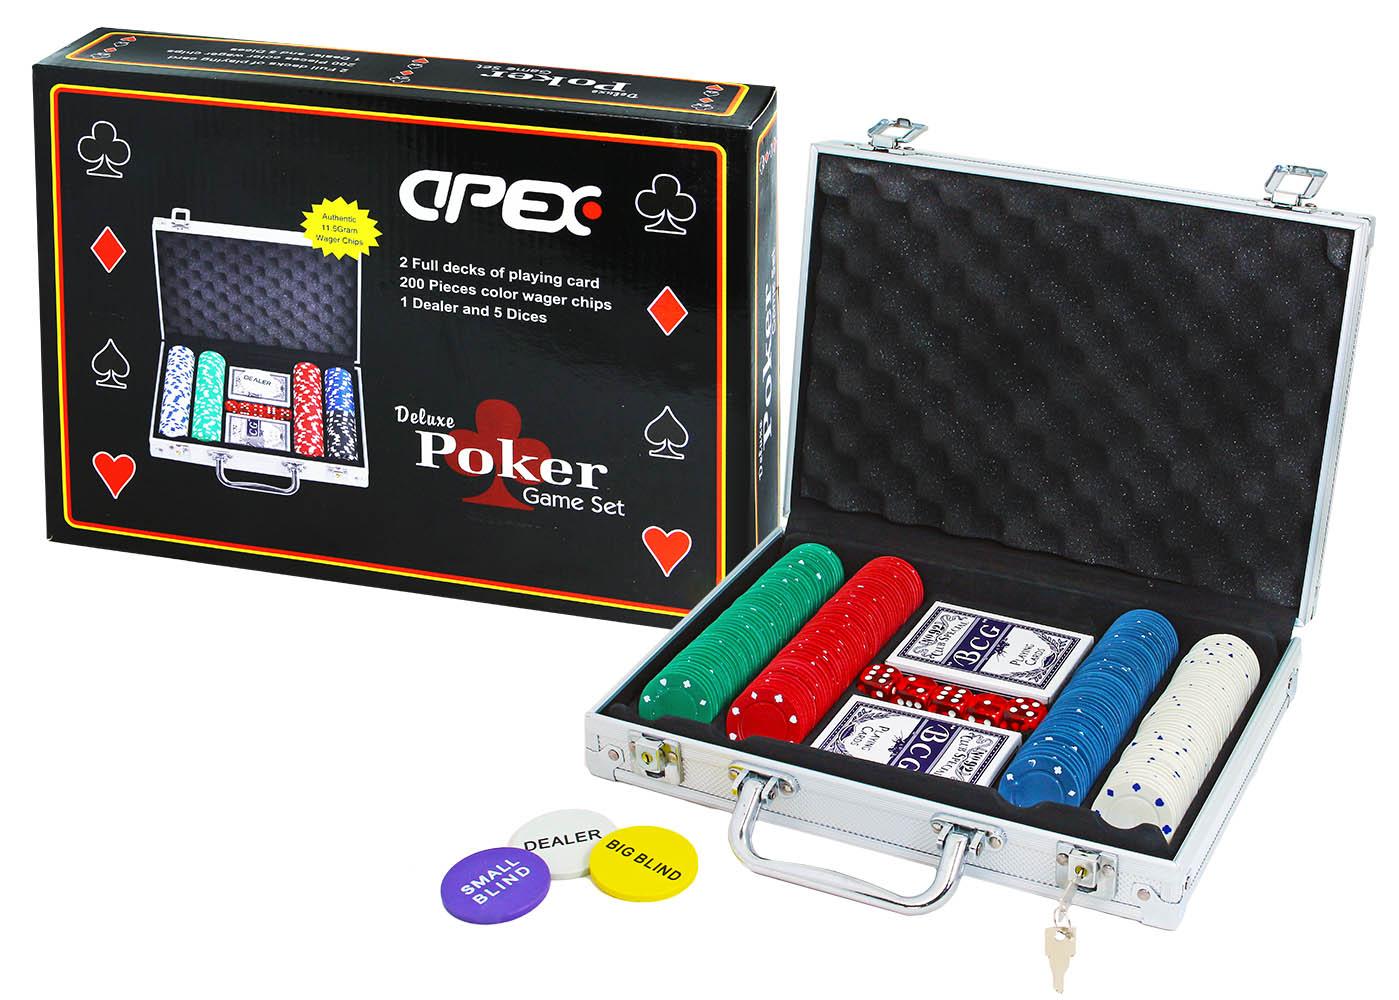 hra Poker deluxe v kufríku 200 žetónov